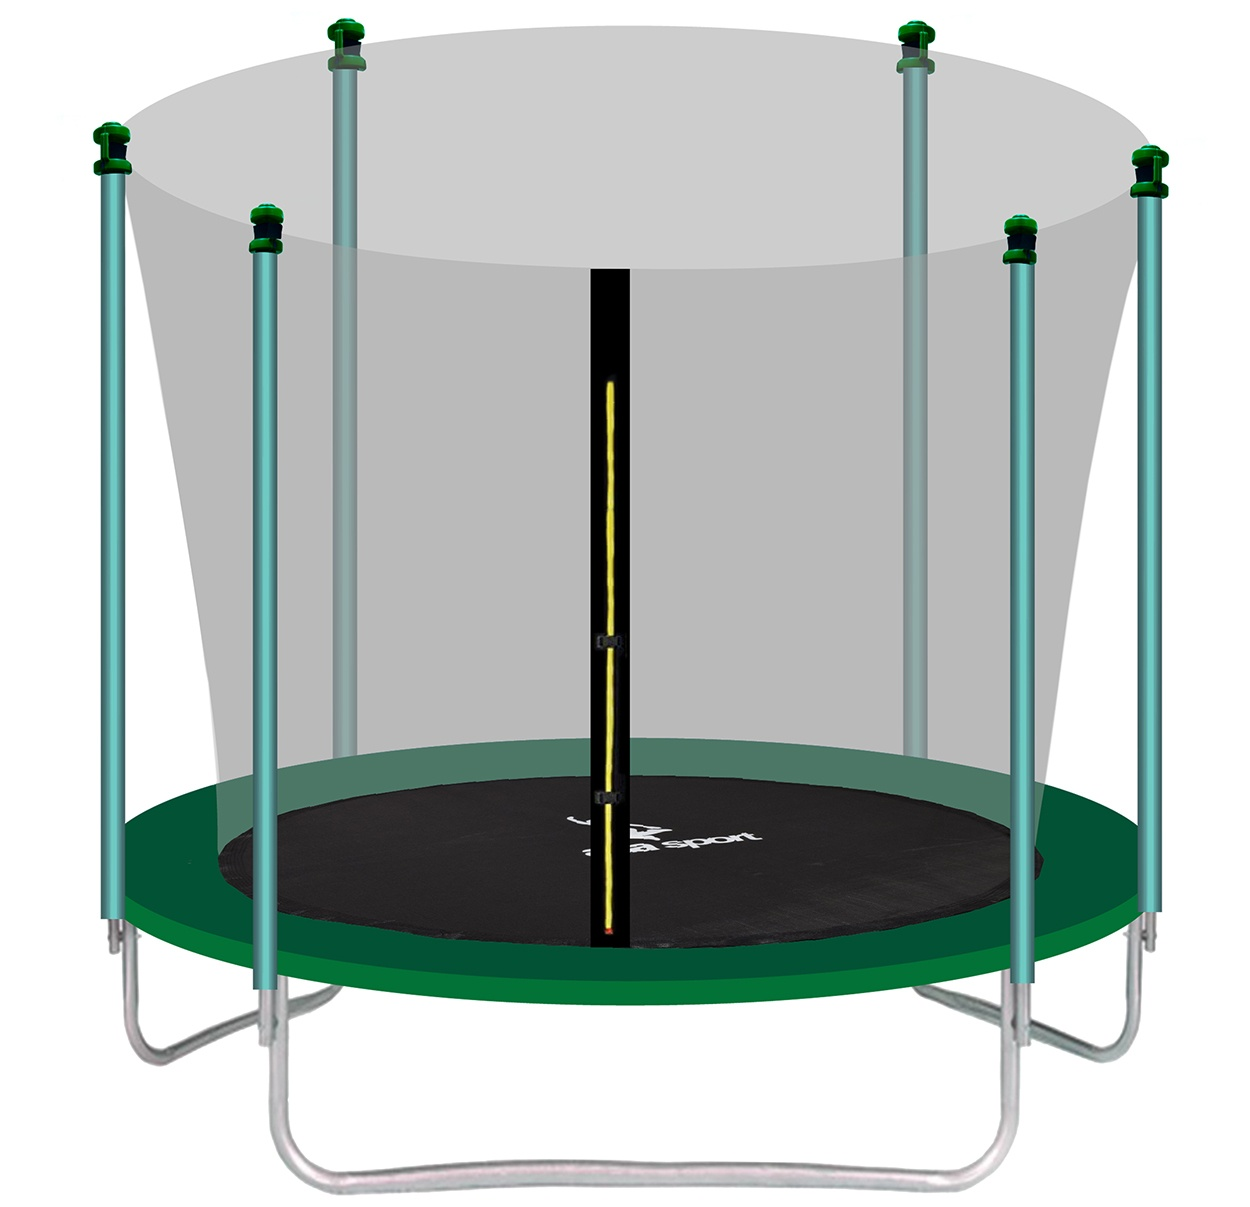 aga sport fit trampol na 250 cm dark green vn torn ochrann sie svet trampol n. Black Bedroom Furniture Sets. Home Design Ideas